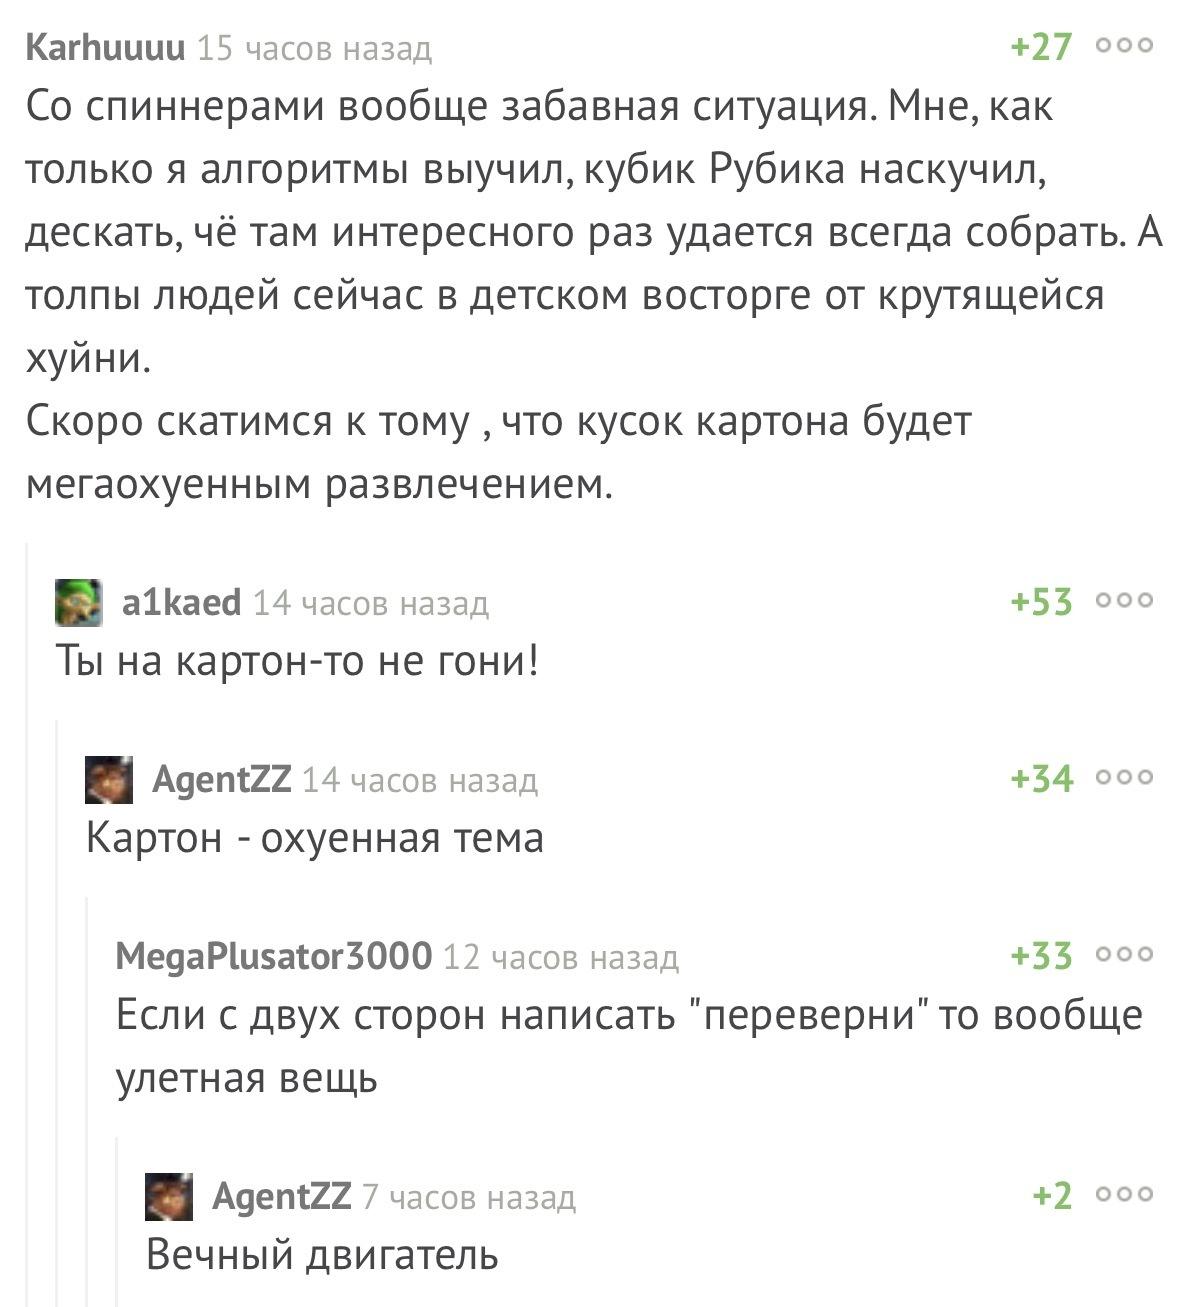 Сила Картона